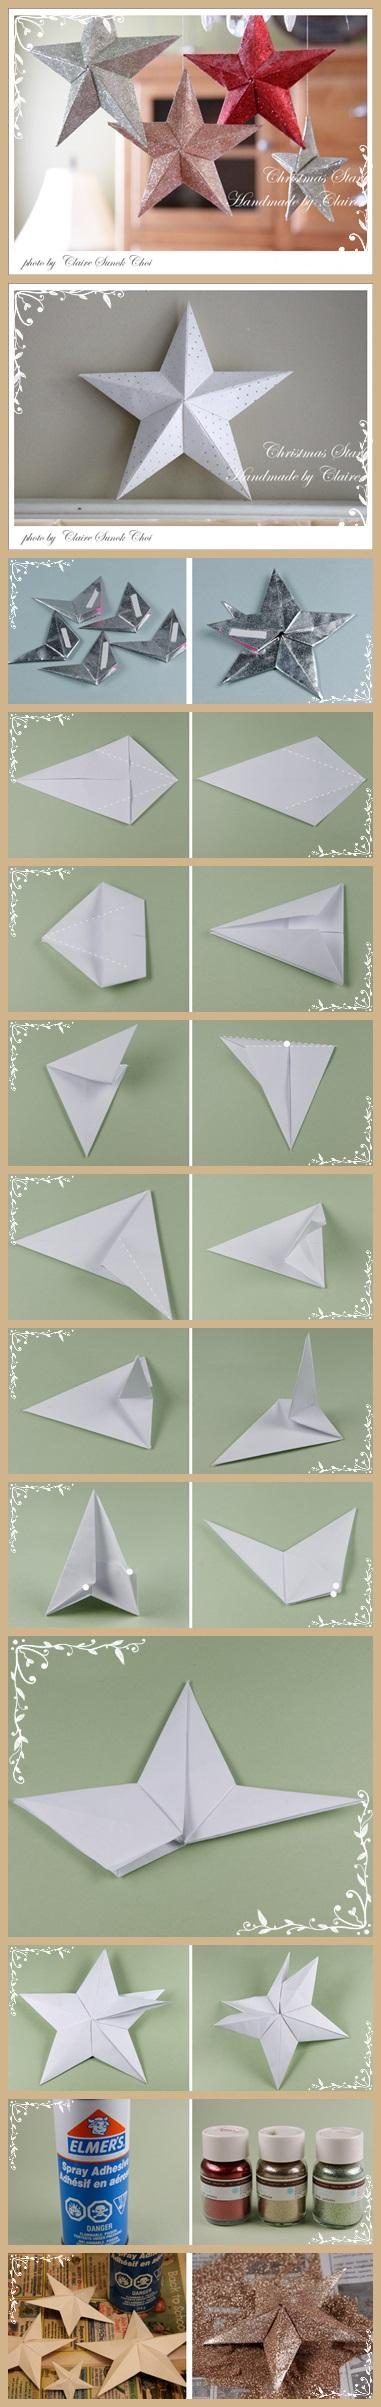 Paper art - making a Christmas star